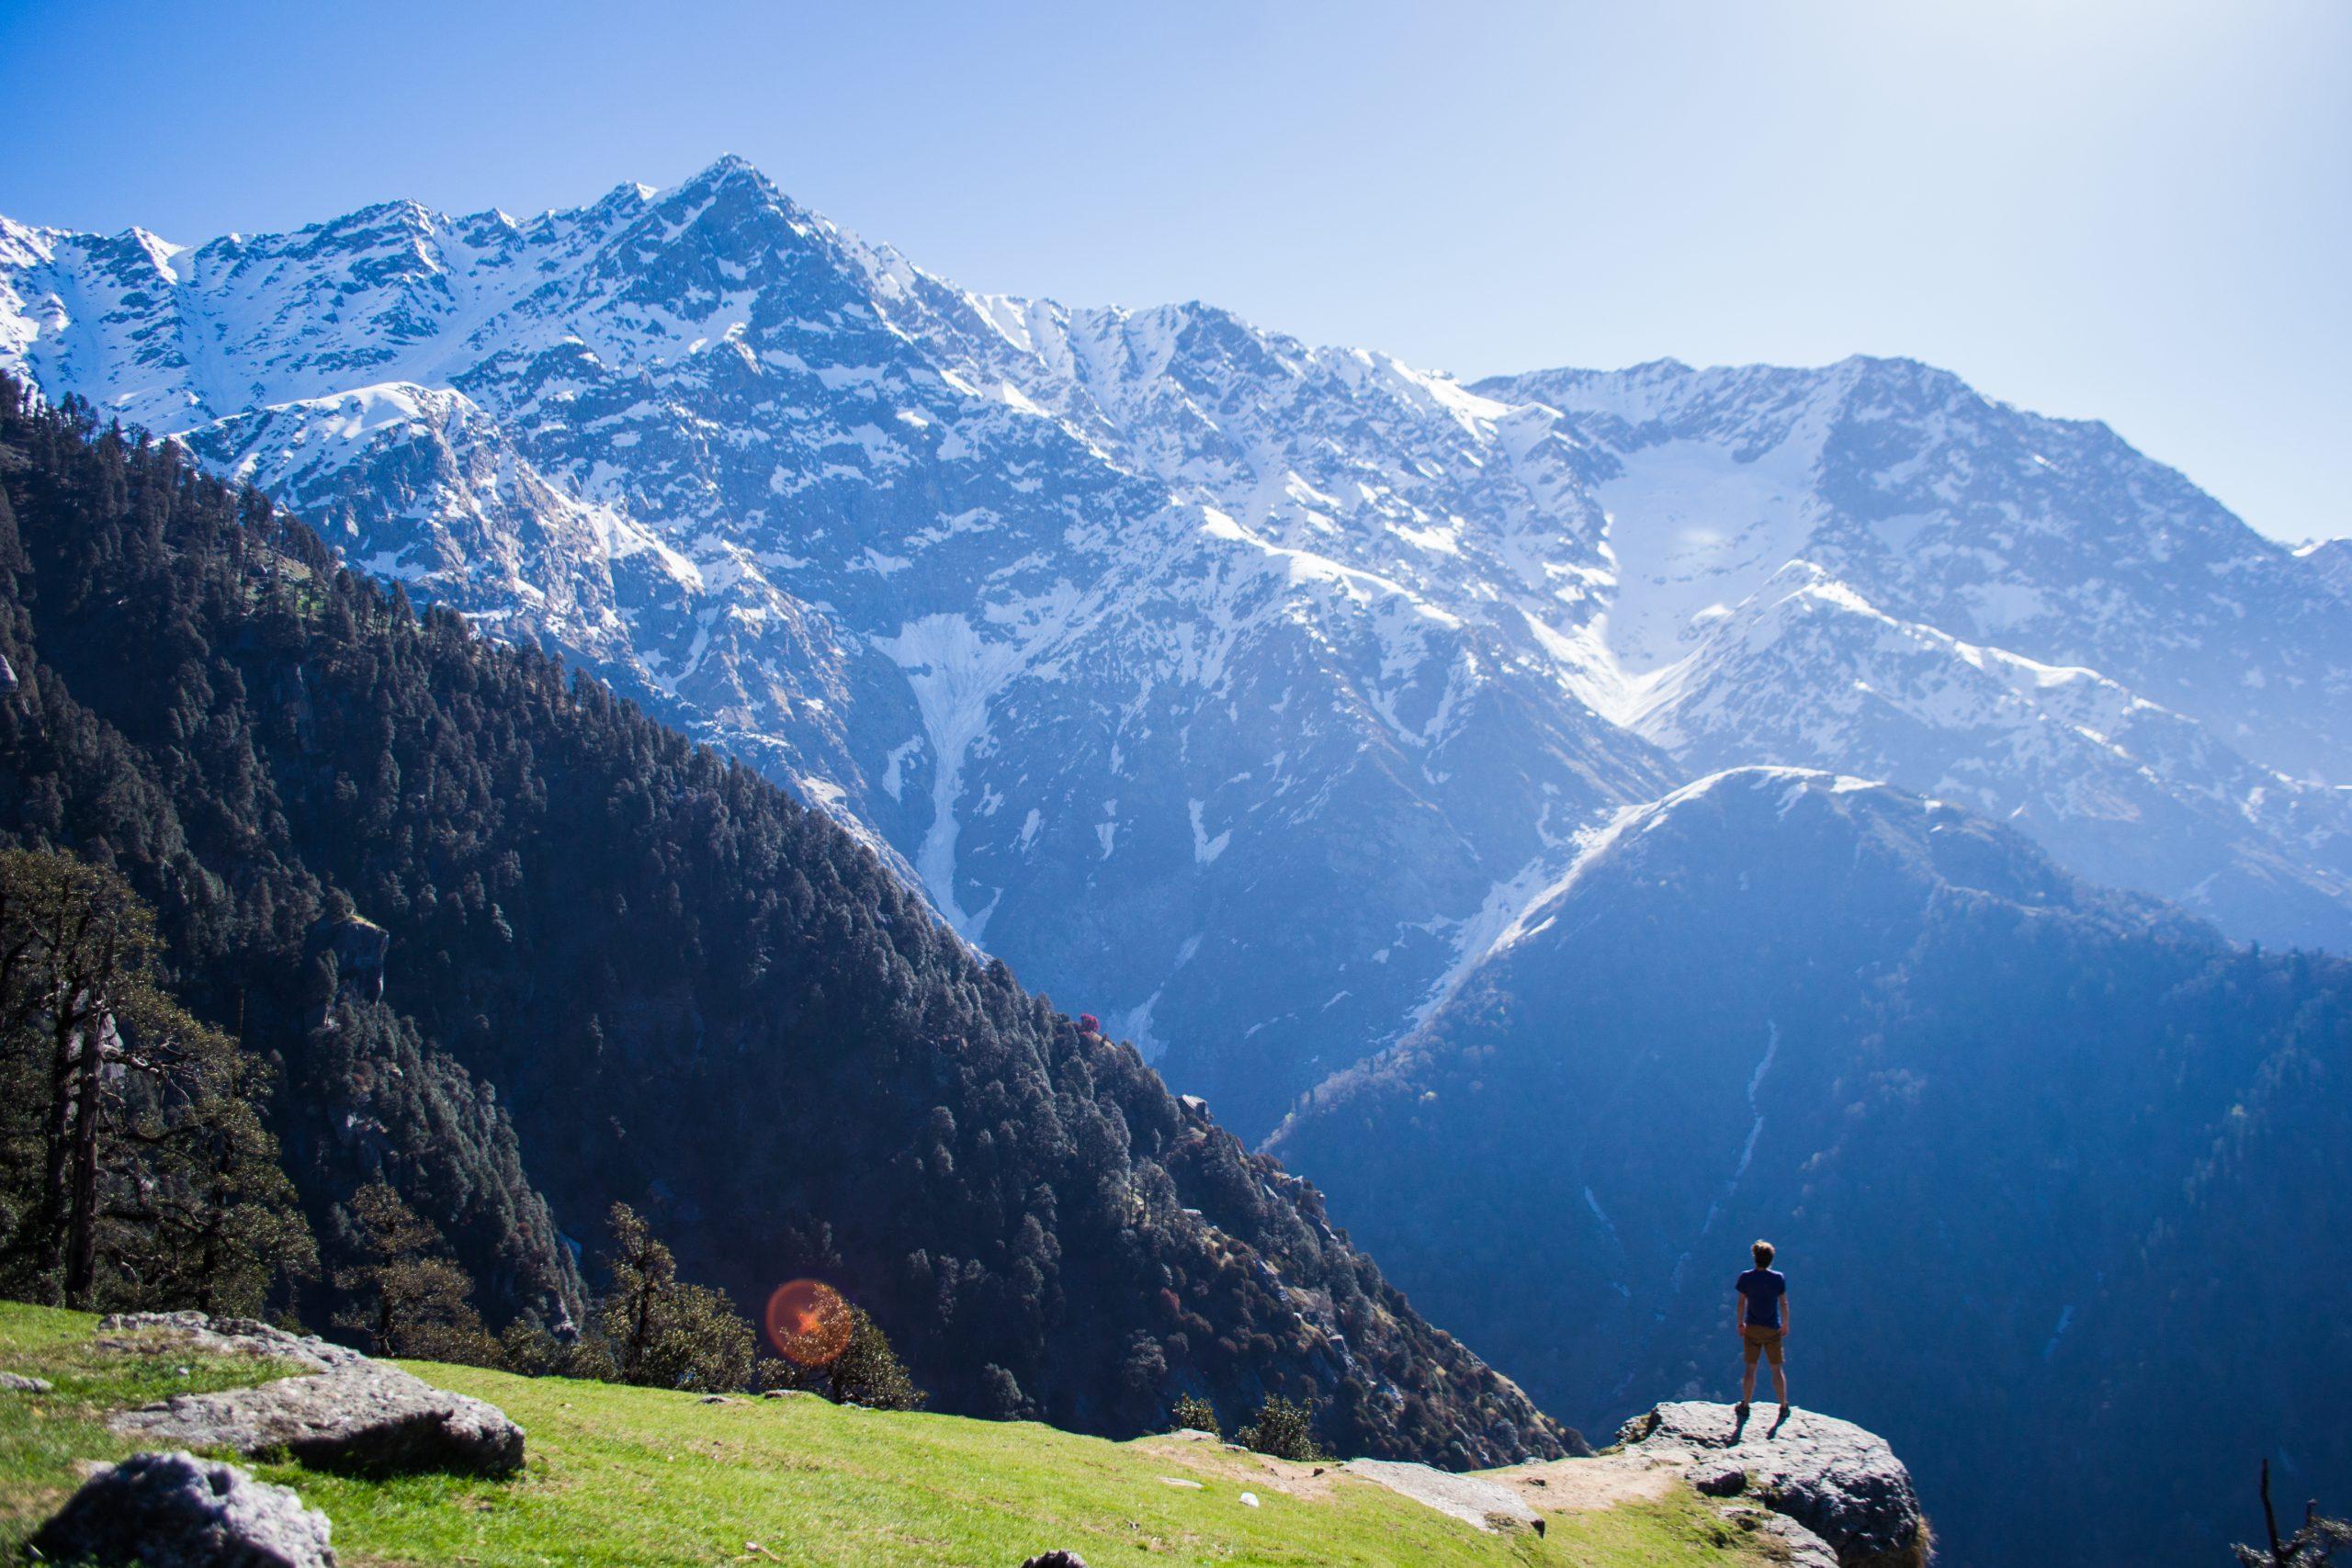 McLeod_Ganj_Dharamkot_Dharmsala_Himachal_Pradesh_India_April_2014